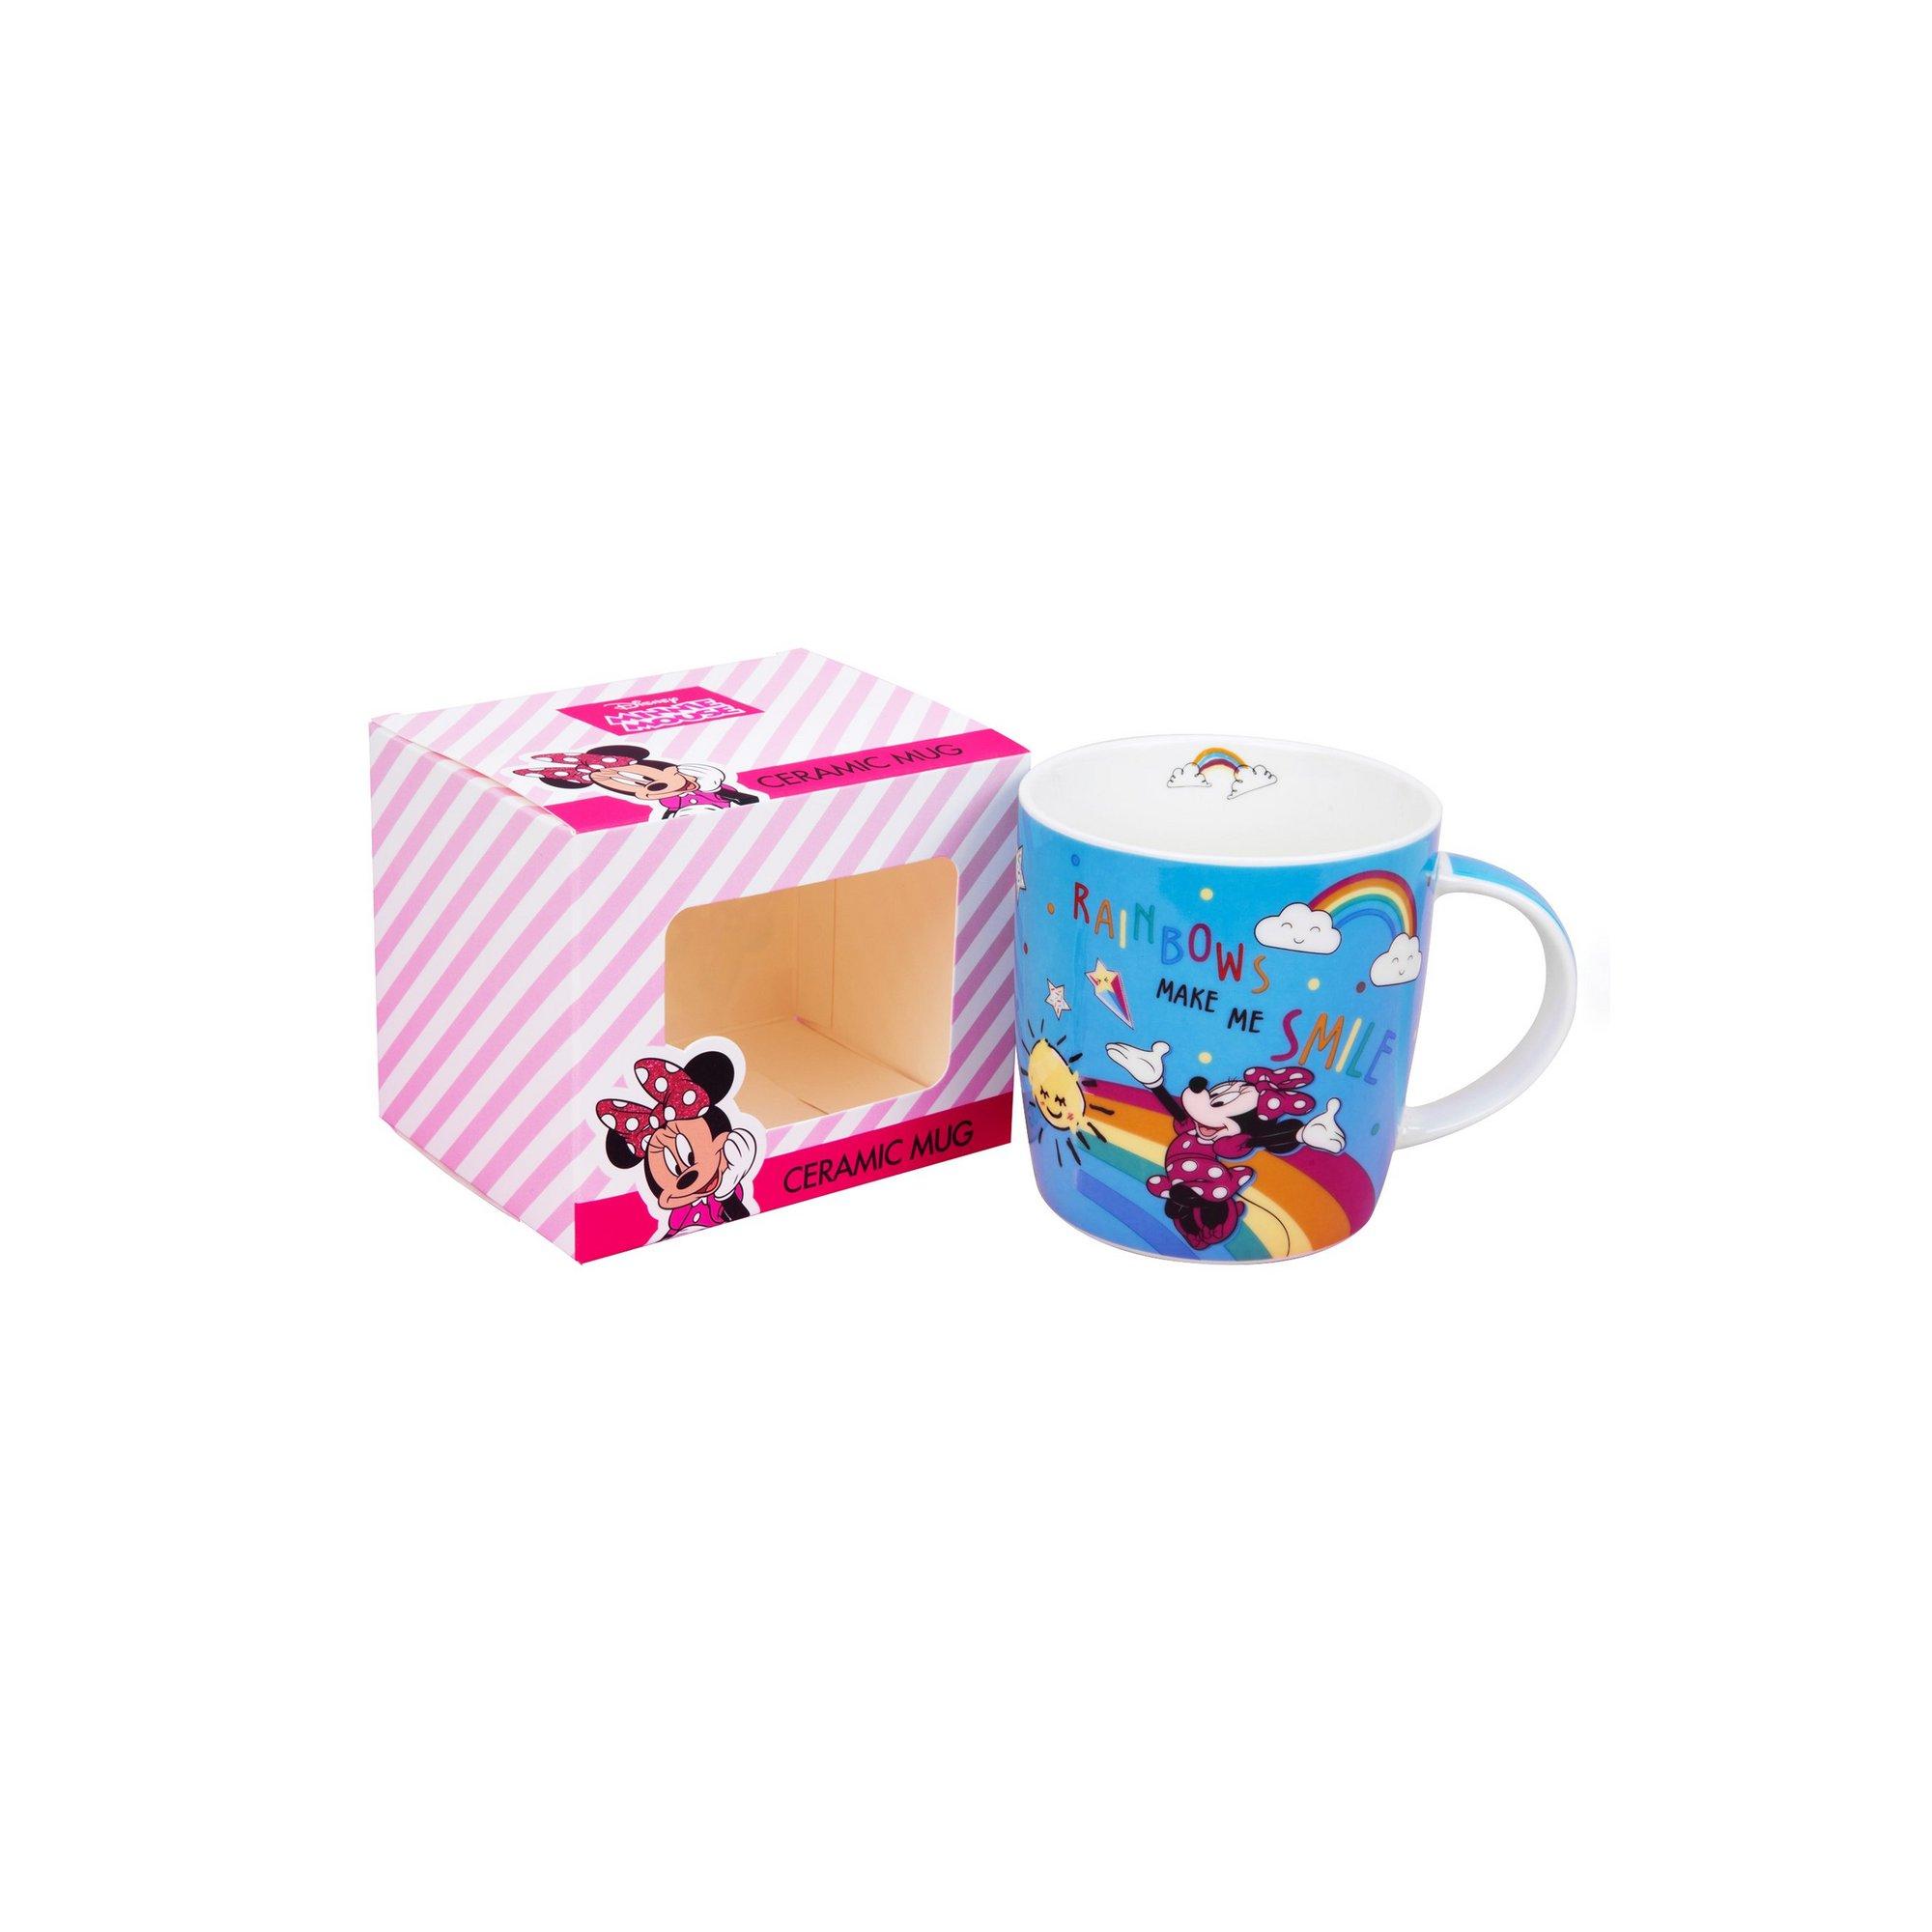 Image of Disney Minnie Mouse Blue Rainbow Mug - Make Me Smile